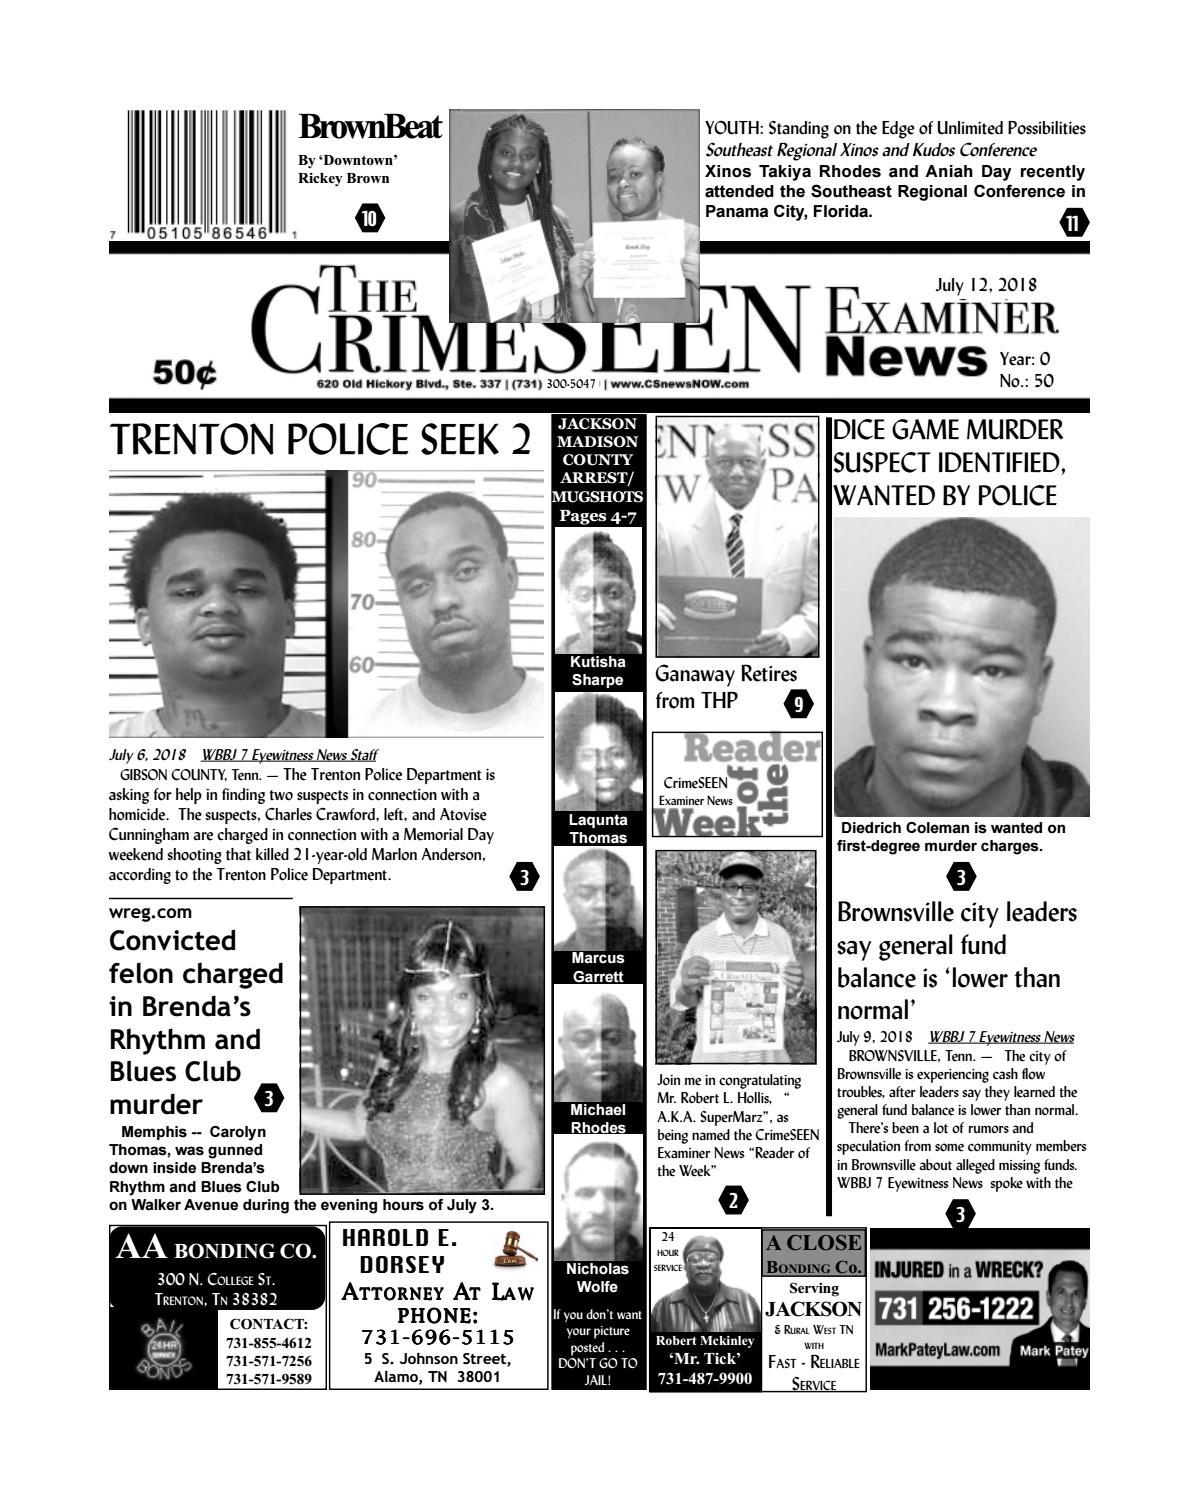 The CrimeSEEN Examiner News July 12, 2018 by CrimeSEEN